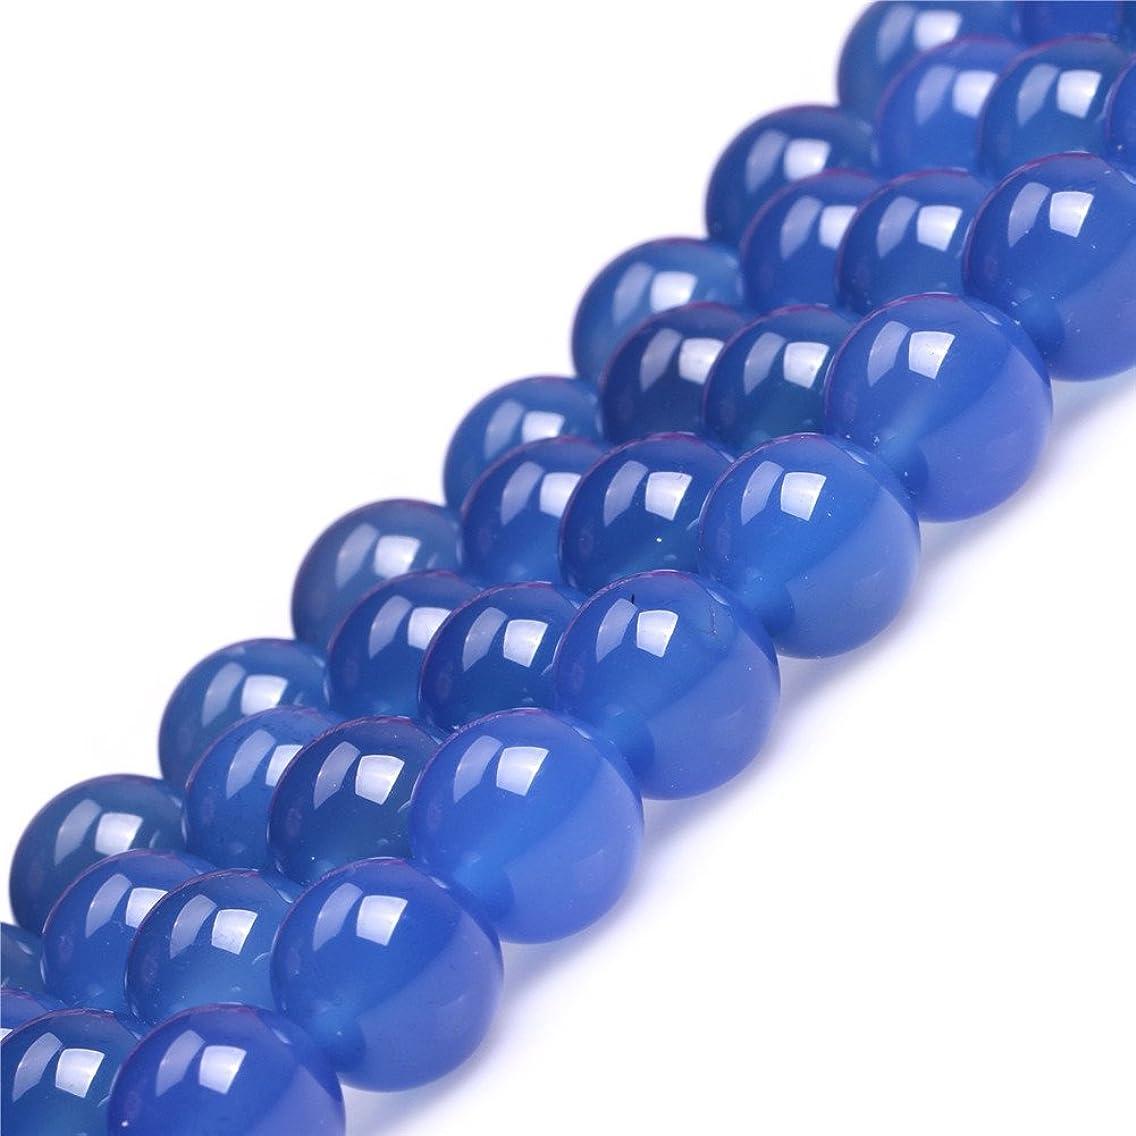 JOE FOREMAN 12mm Blue Agate Semi Precious Gemstone Round Loose Beads for Jewelry Making DIY Handmade Craft Supplies 15